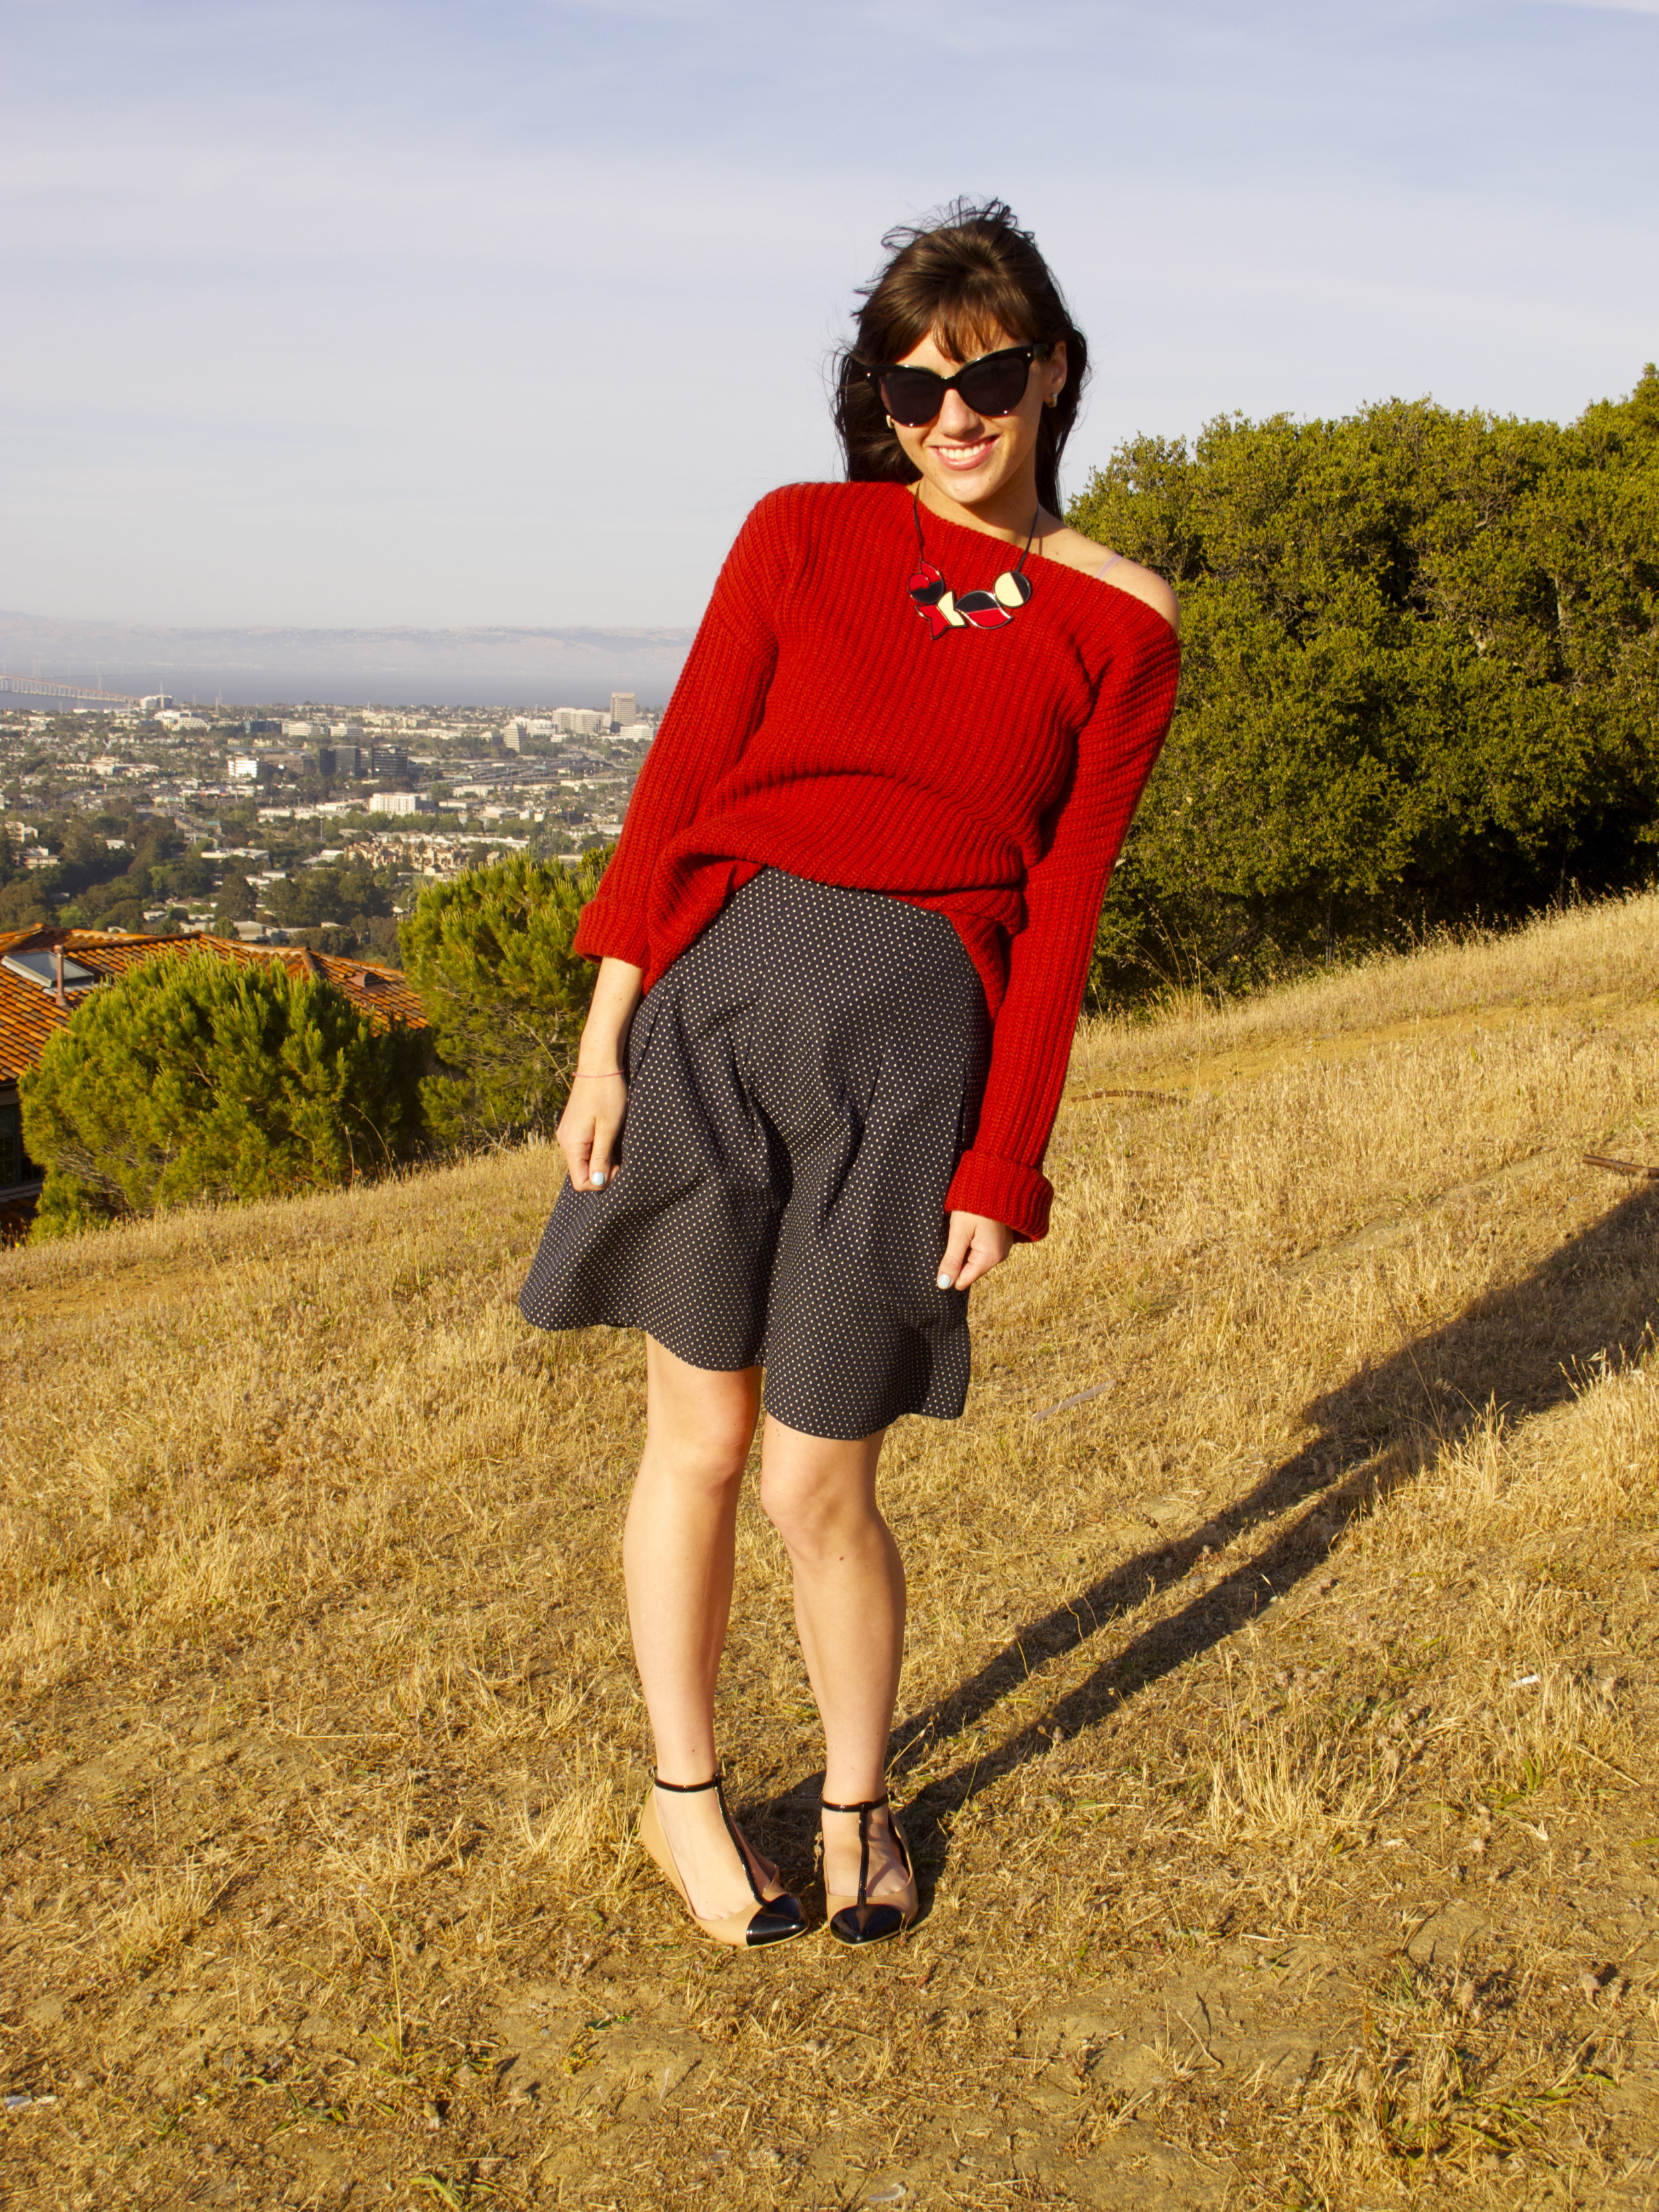 Sweater: Vince, Loft; Polka Dot Skirt: Jigsaw London; Shoes; Sole Society, Nordstroms; Necklace; Vintgae